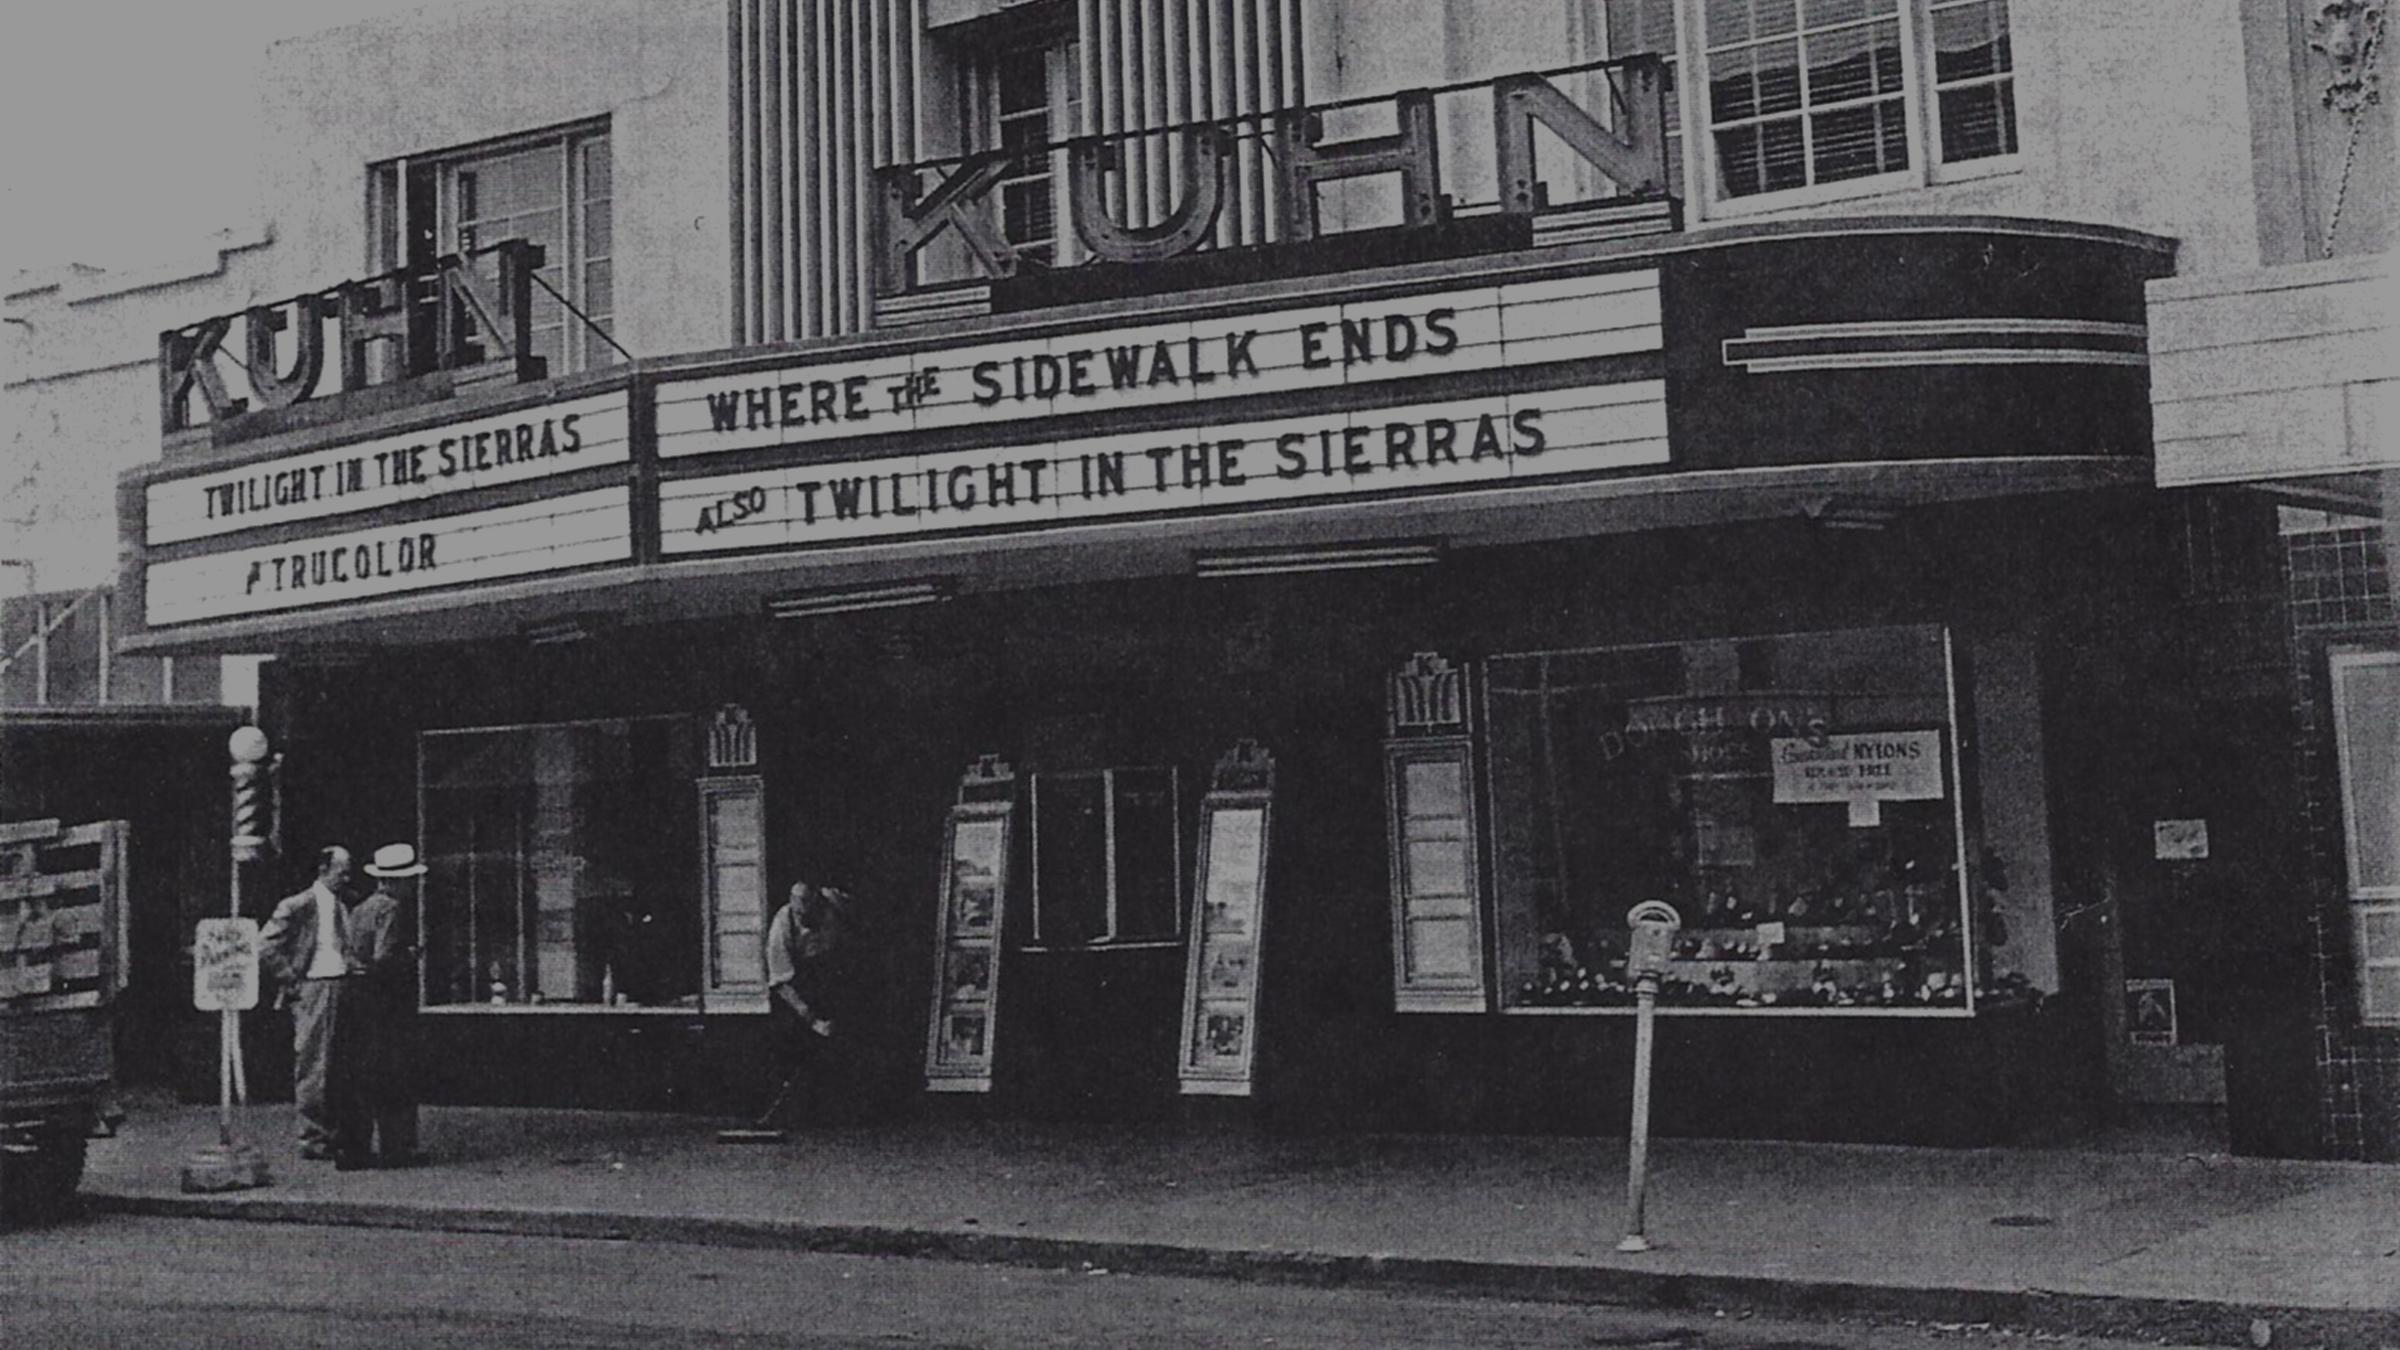 Kuhn-Cinema-Historic-Movie-Theater.jpg